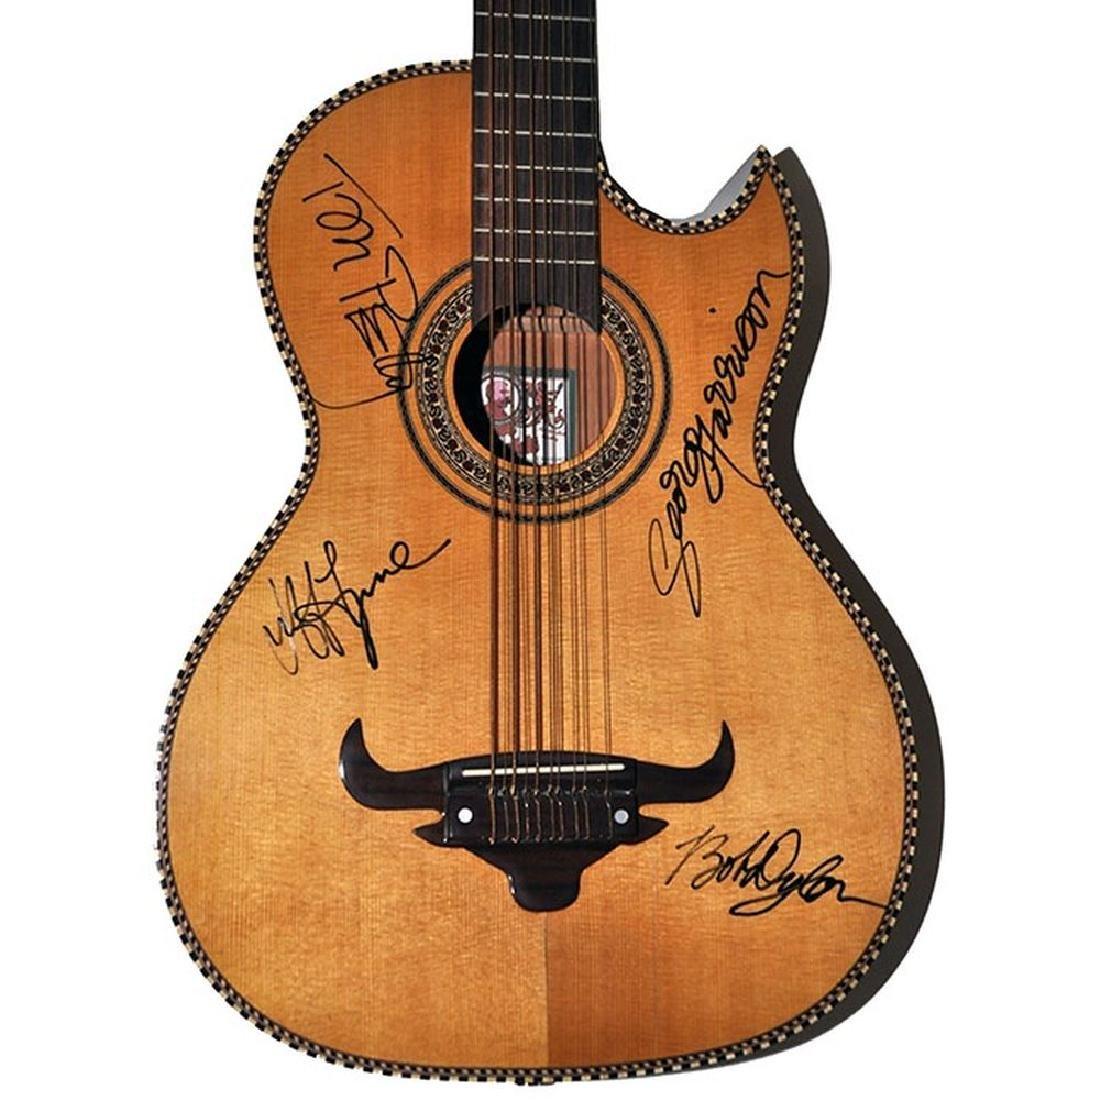 The Traveling Willburys Signed Guitar